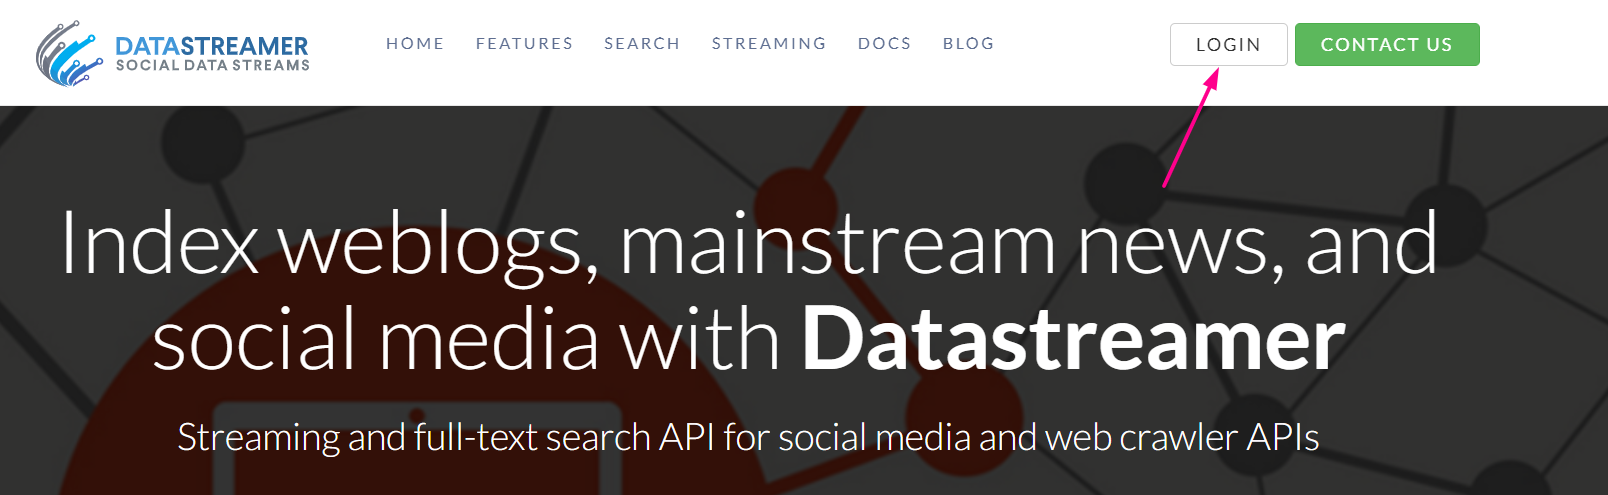 DataStreamer - Overview